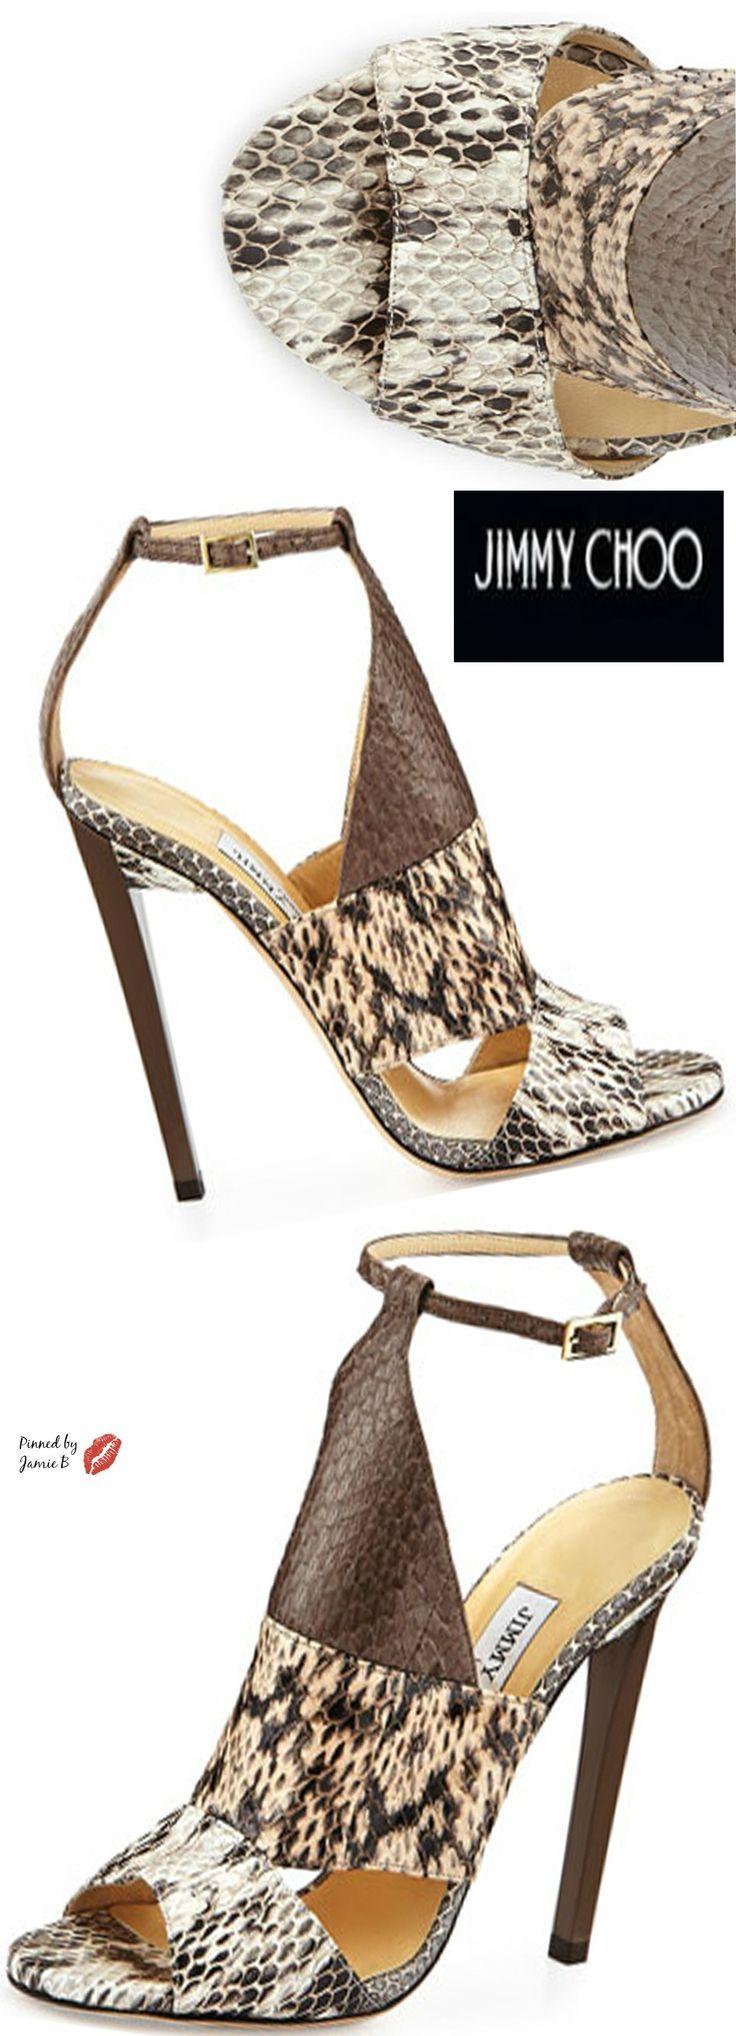 Jimmy Choo | Timbus Colorblock Snakeskin Sandal | Jamie B